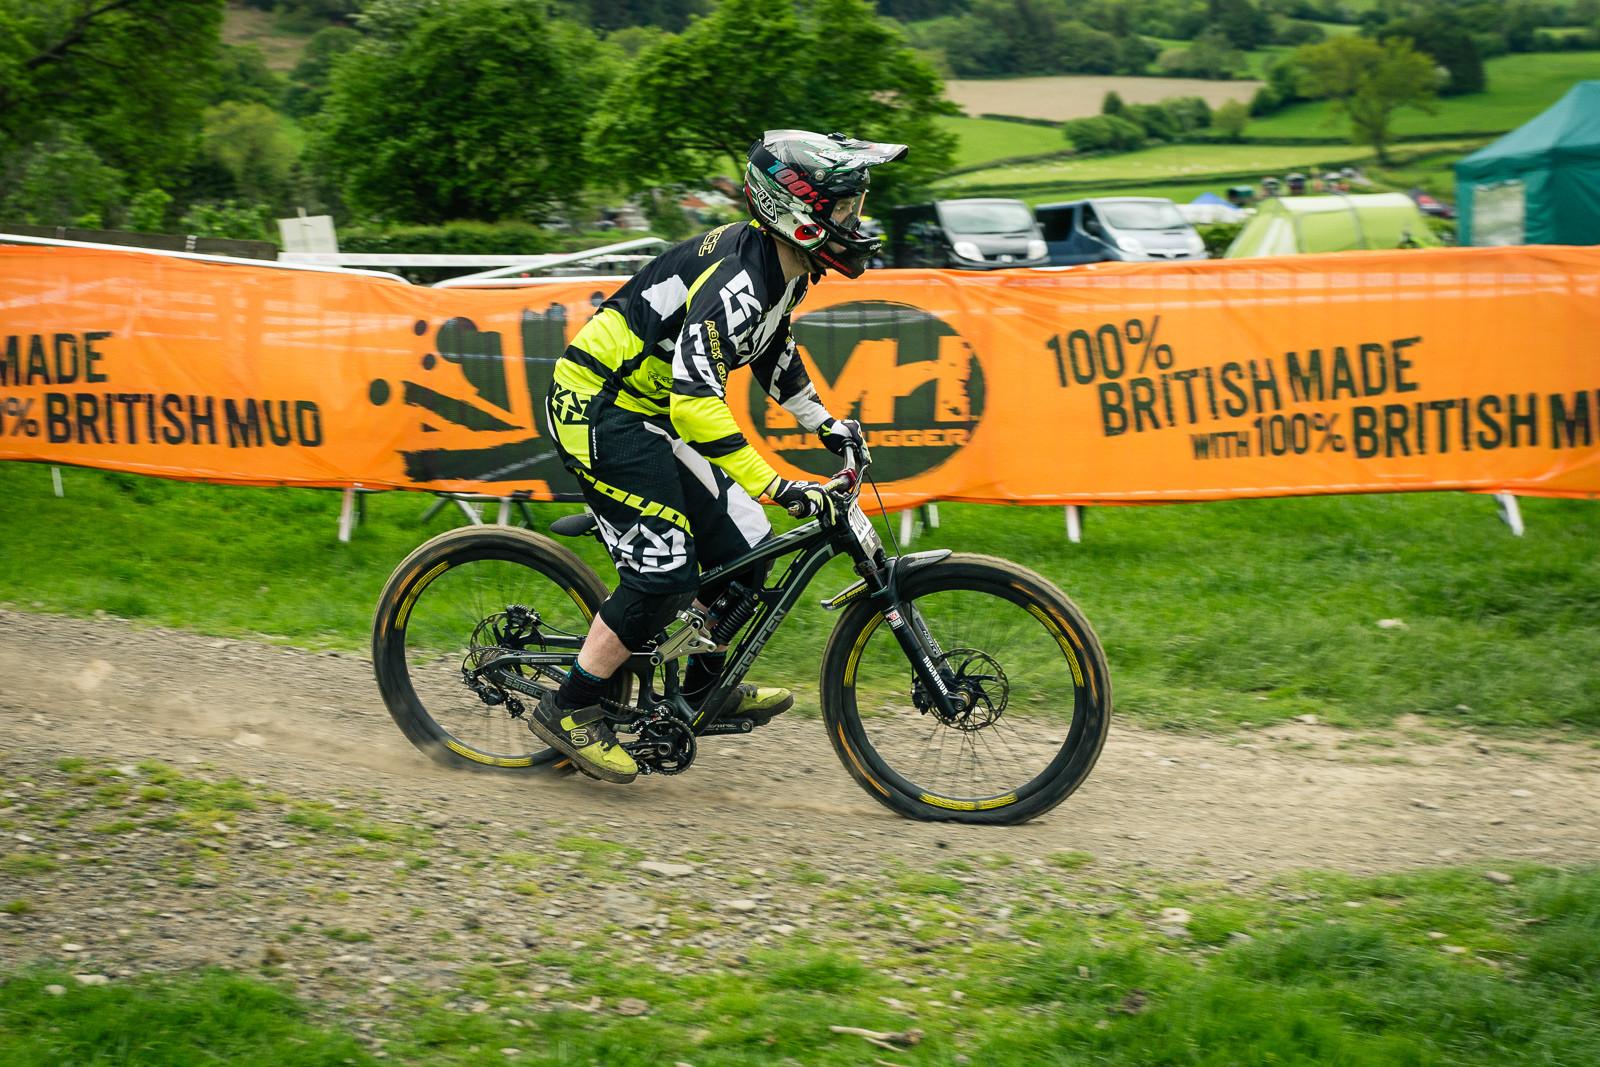 Saracen Myst G-ed Out at Llangollen - G-Out Project - Llangollen BDS 2015 - Mountain Biking Pictures - Vital MTB